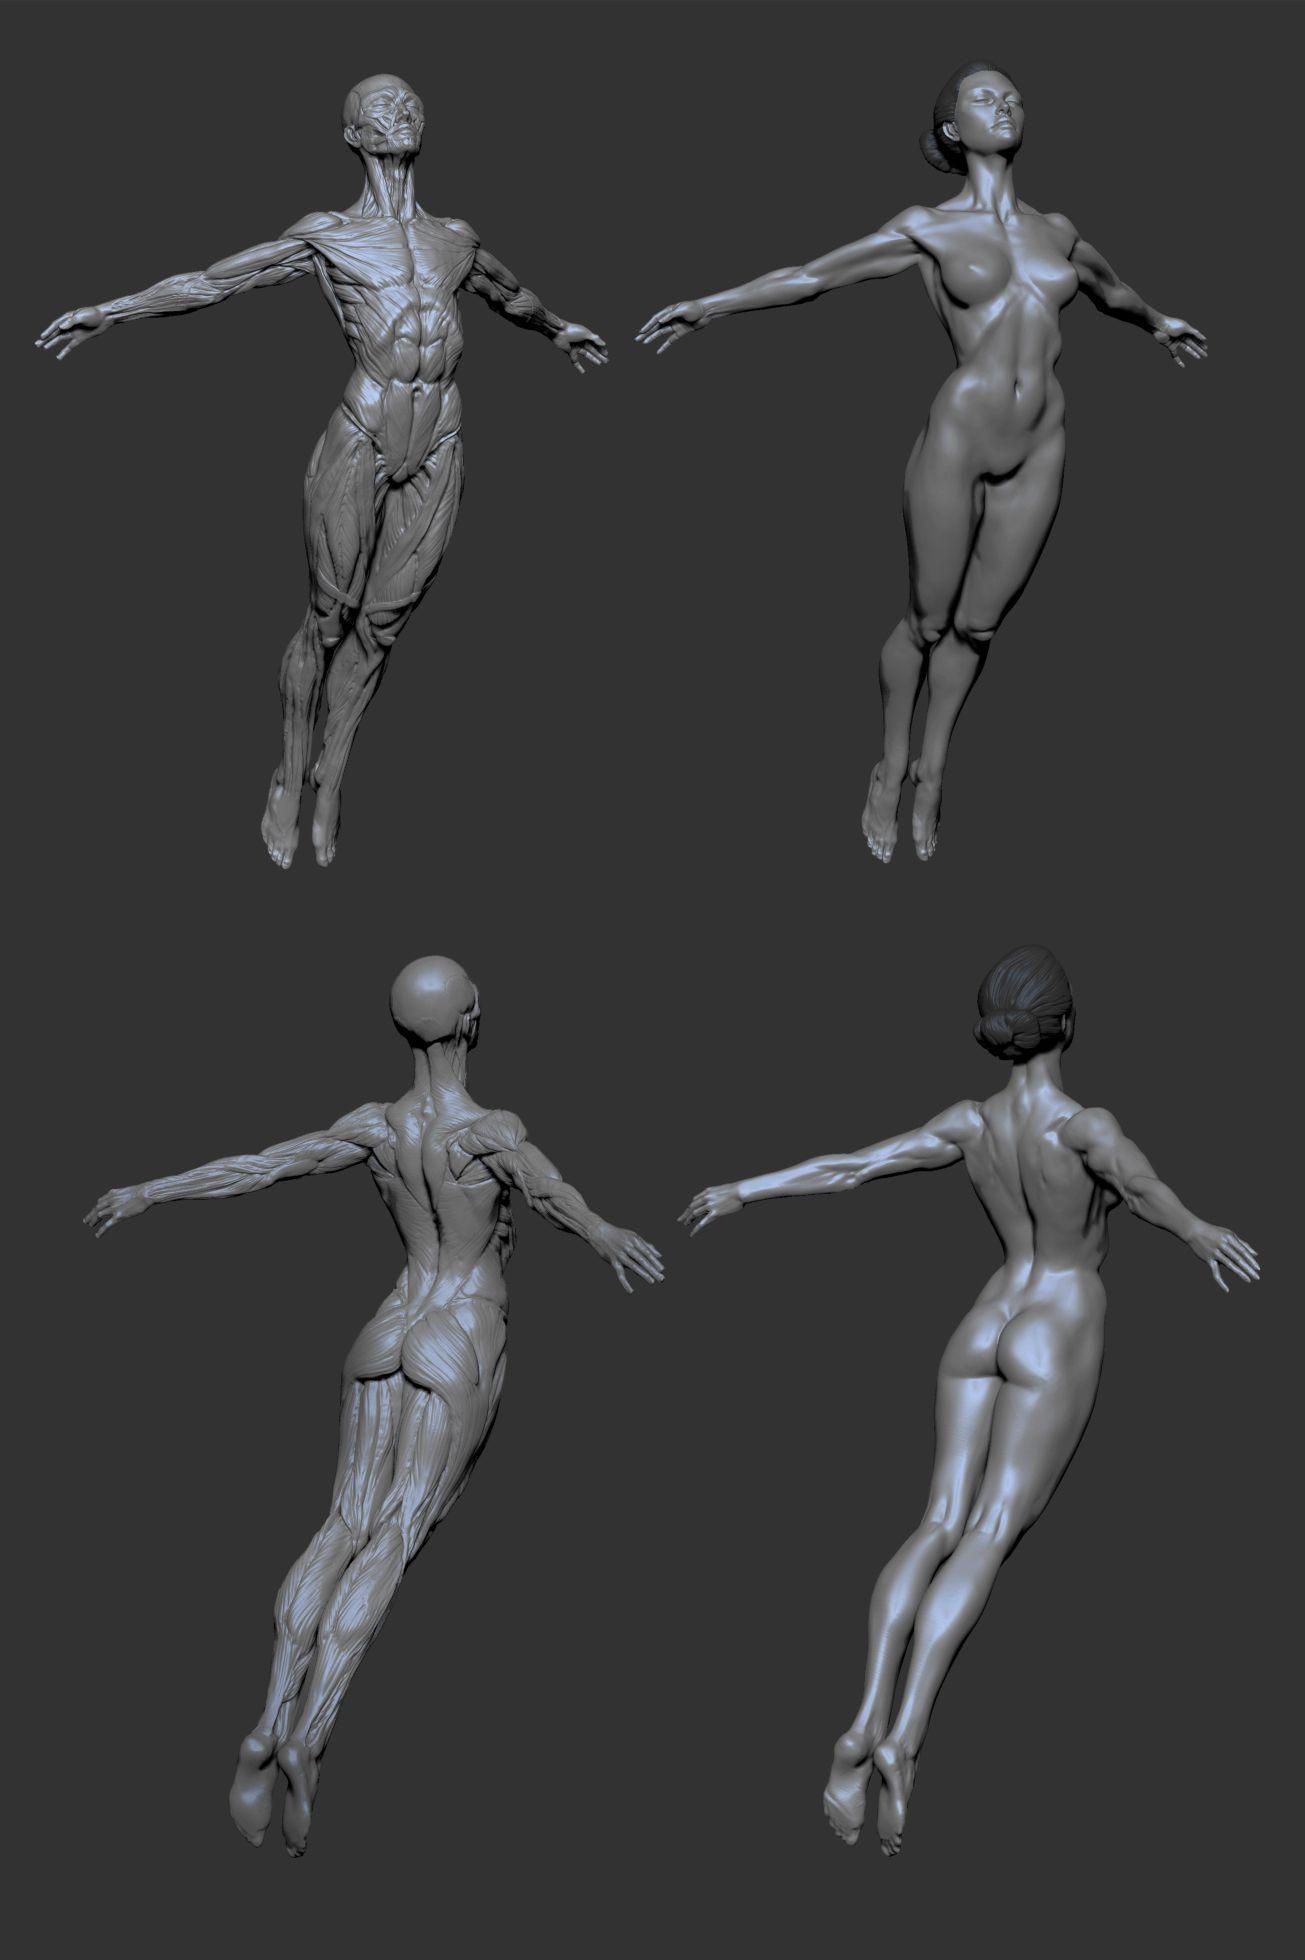 Female Anatomy By Mojette On Deviantart Anatomyfemale